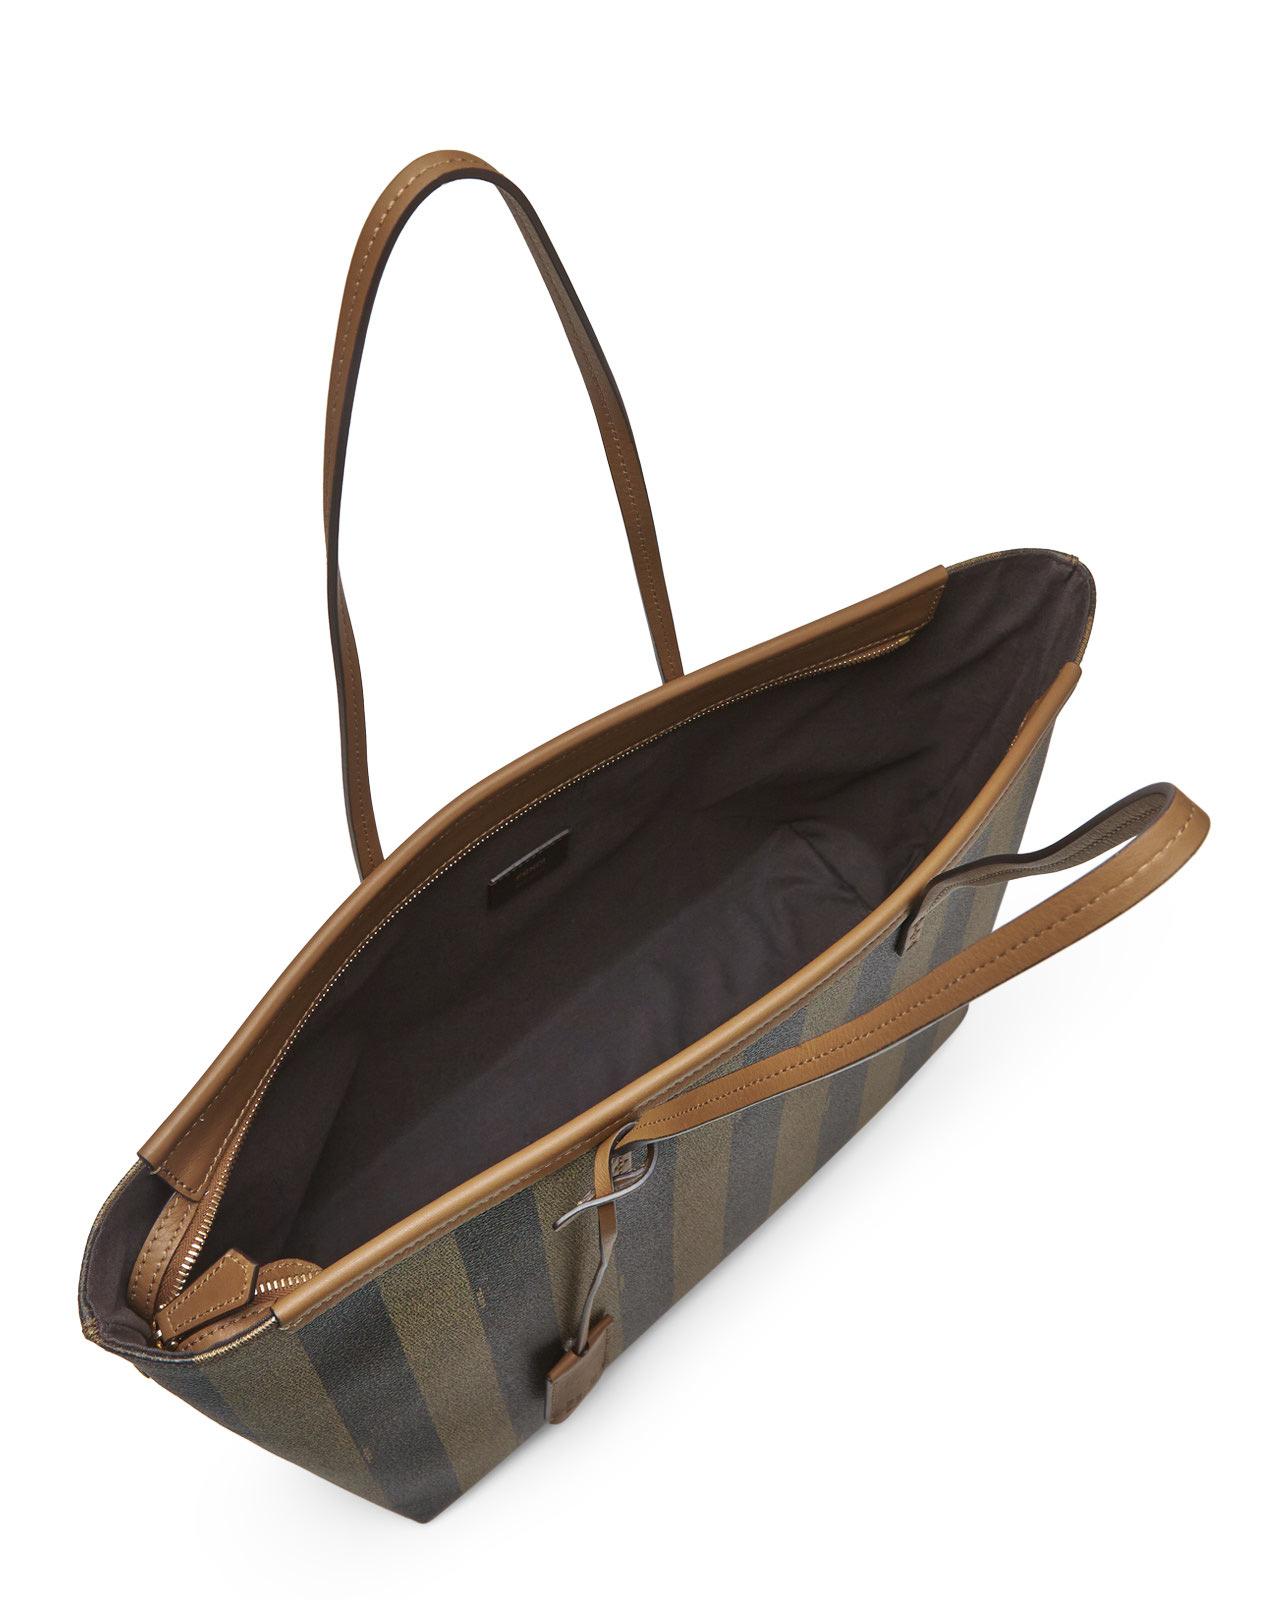 Lyst - Fendi Pequin Roll Tote in Brown 2b13b62fef